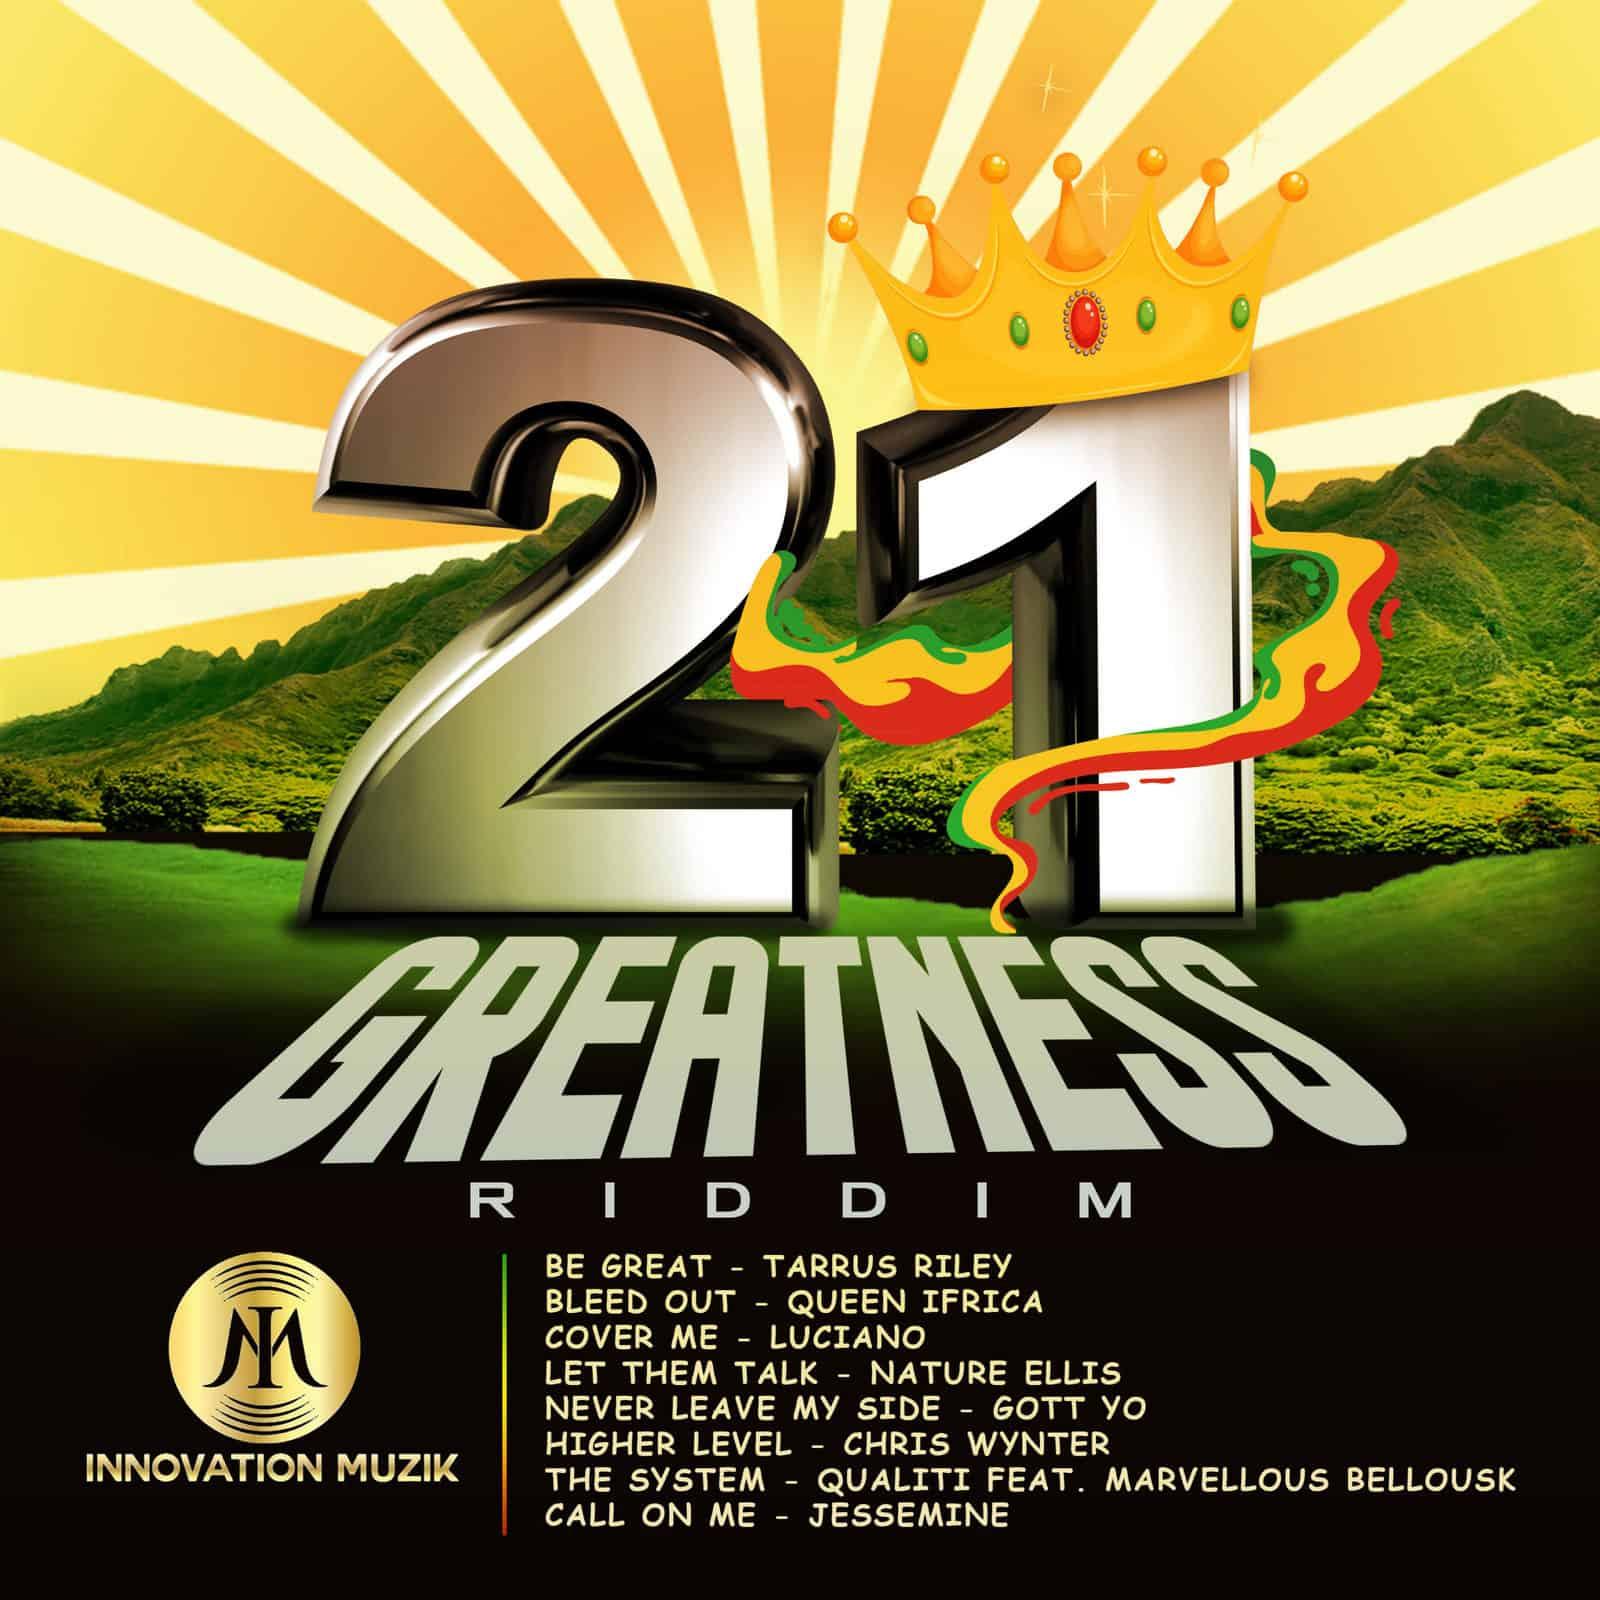 21 Greatness Riddim